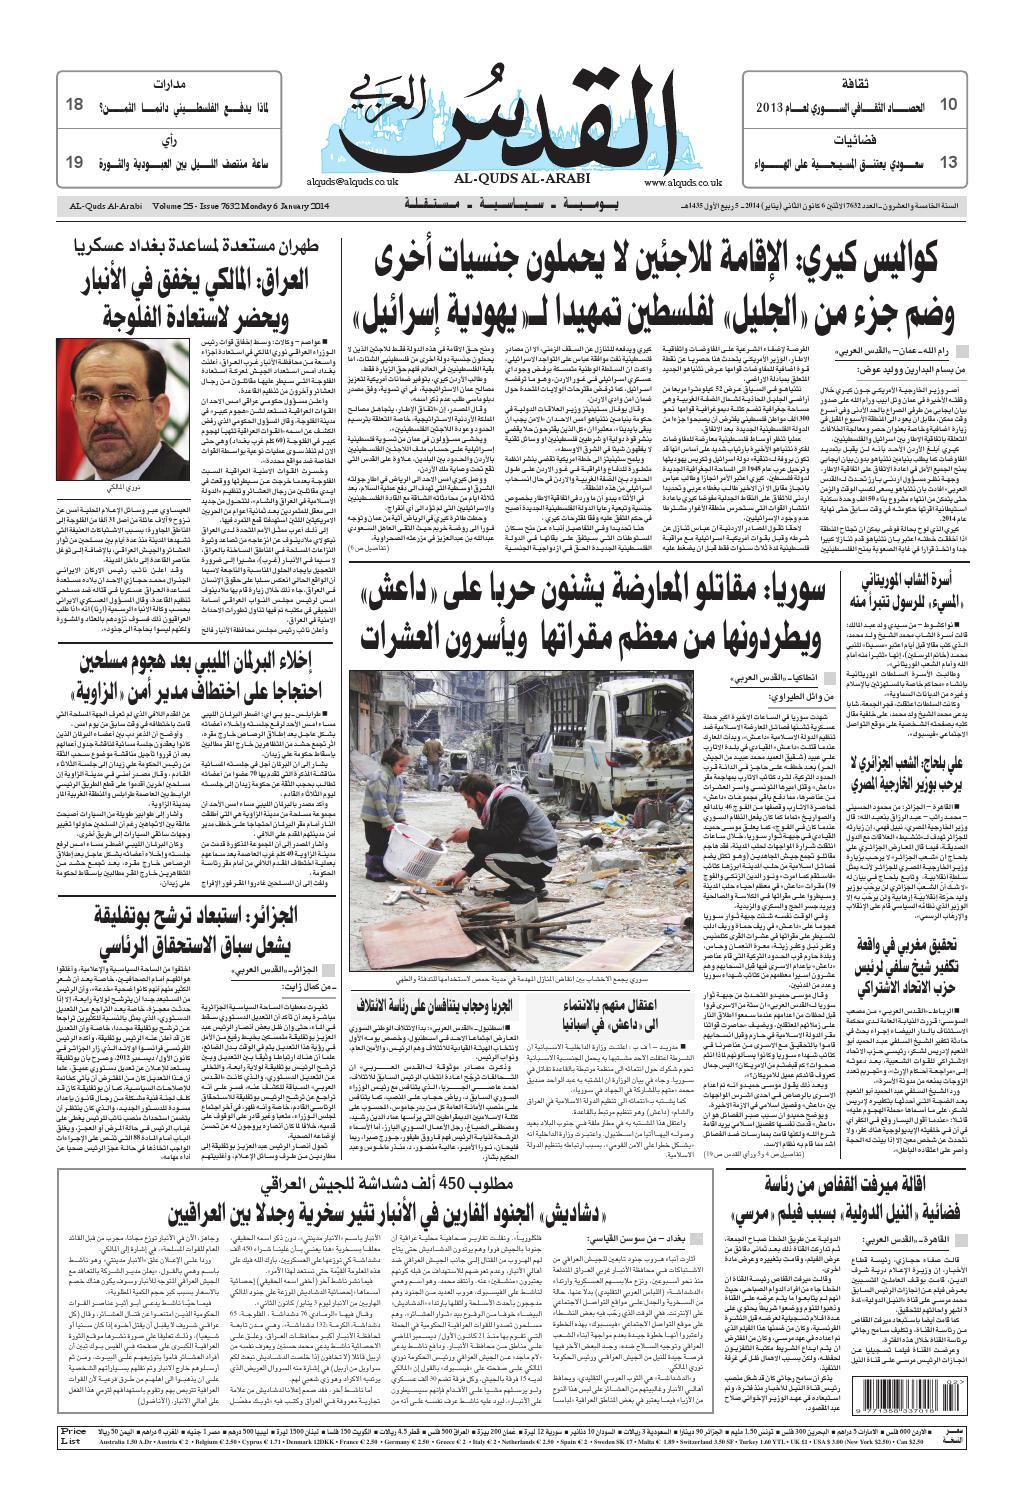 3868b8628 صحيفة القدس العربي , الإثنين 06.01.2014 by مركز الحدث - issuu